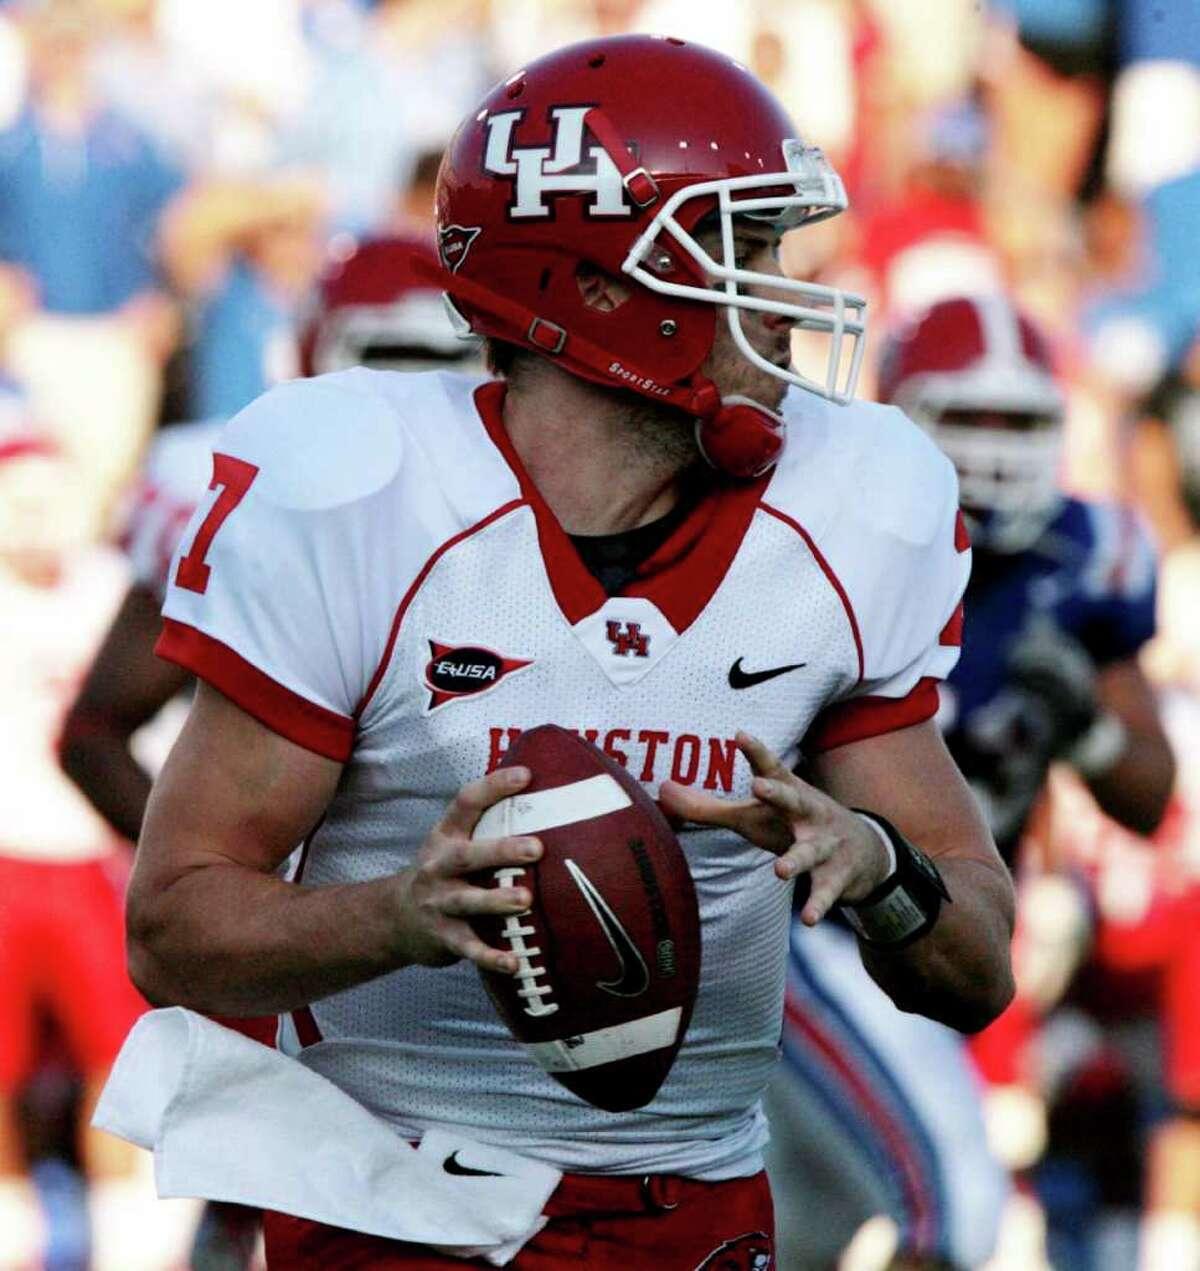 Houston quarterback Case Keenum (7) looks to throw a pass against Louisiana Tech during their NCAA college football game, Saturday, Sept. 17, 2011, in Ruston, La. (AP Photo/The News-Star, Ben Corda)